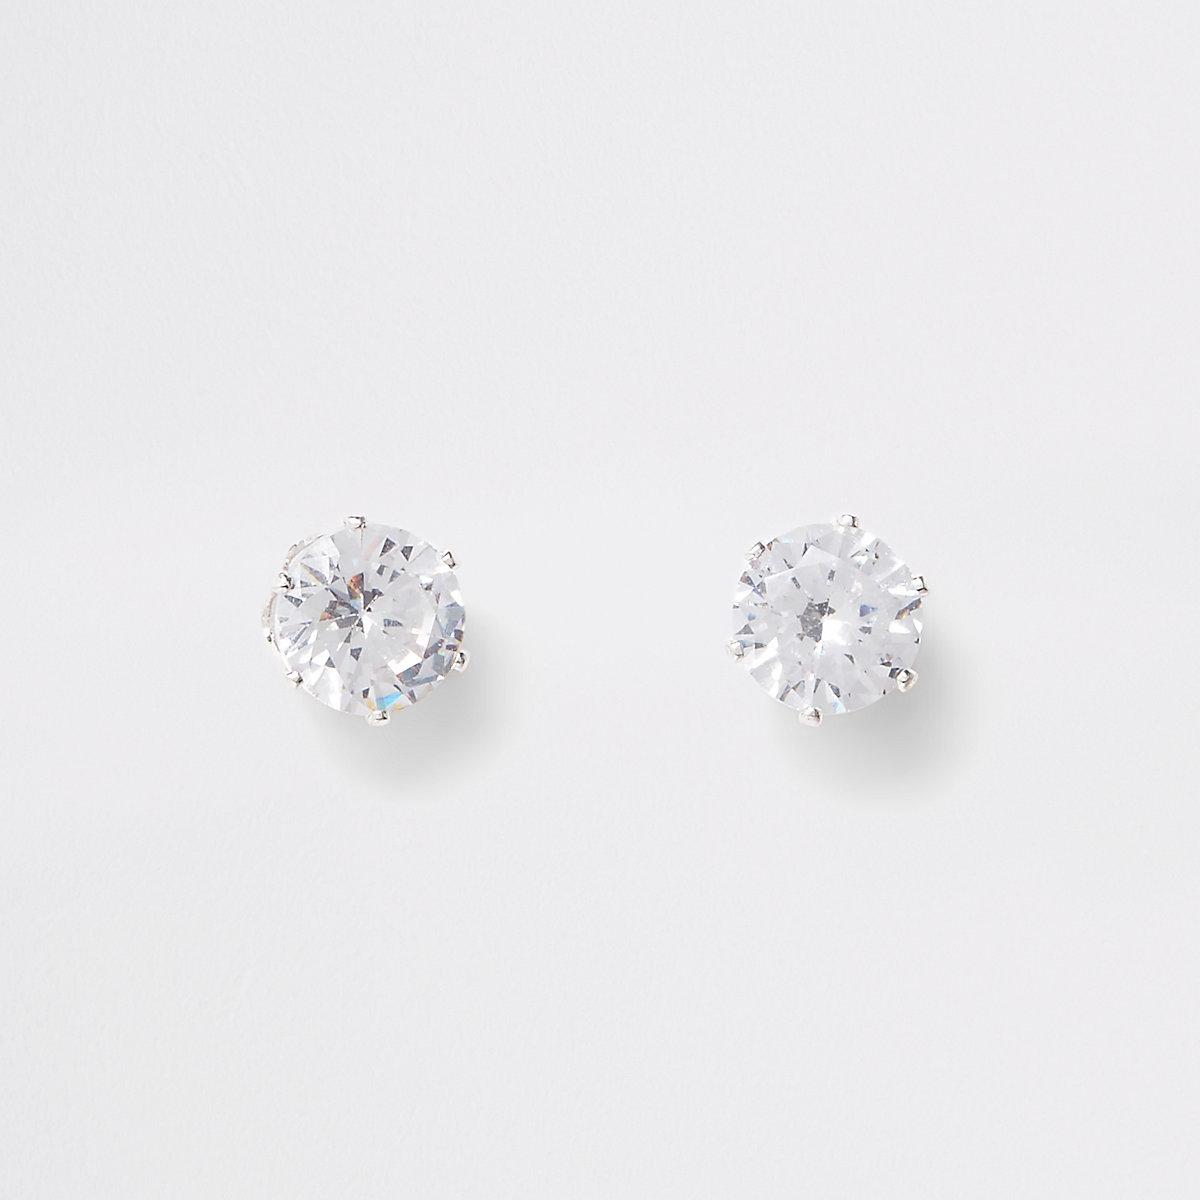 Silver plated cubic zirconia stud earrings